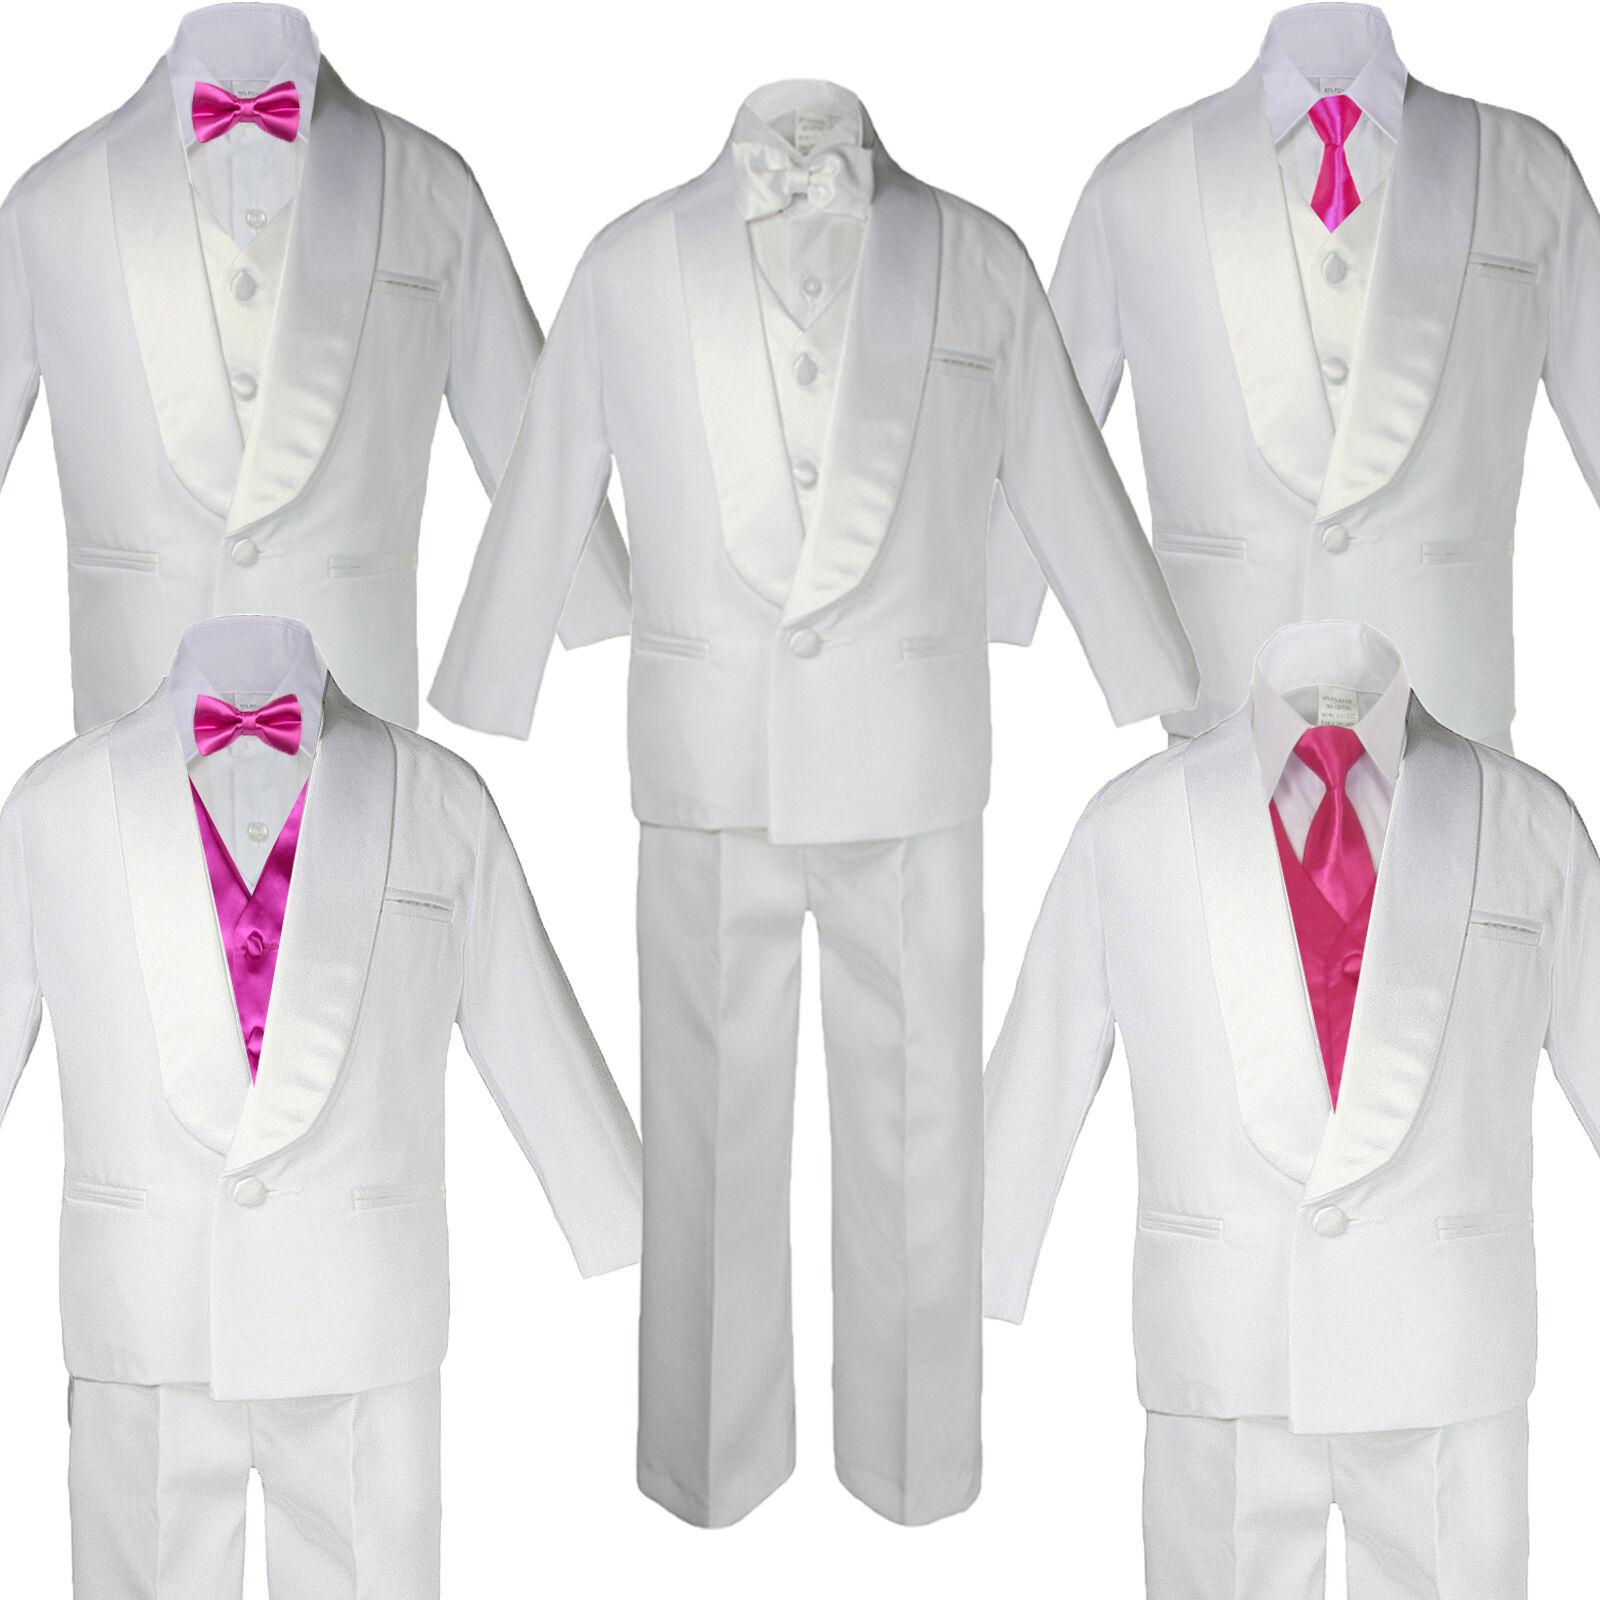 5-7pc Boy White Satin Shawl Lapel Suits Tuxedo Hot Pink S...